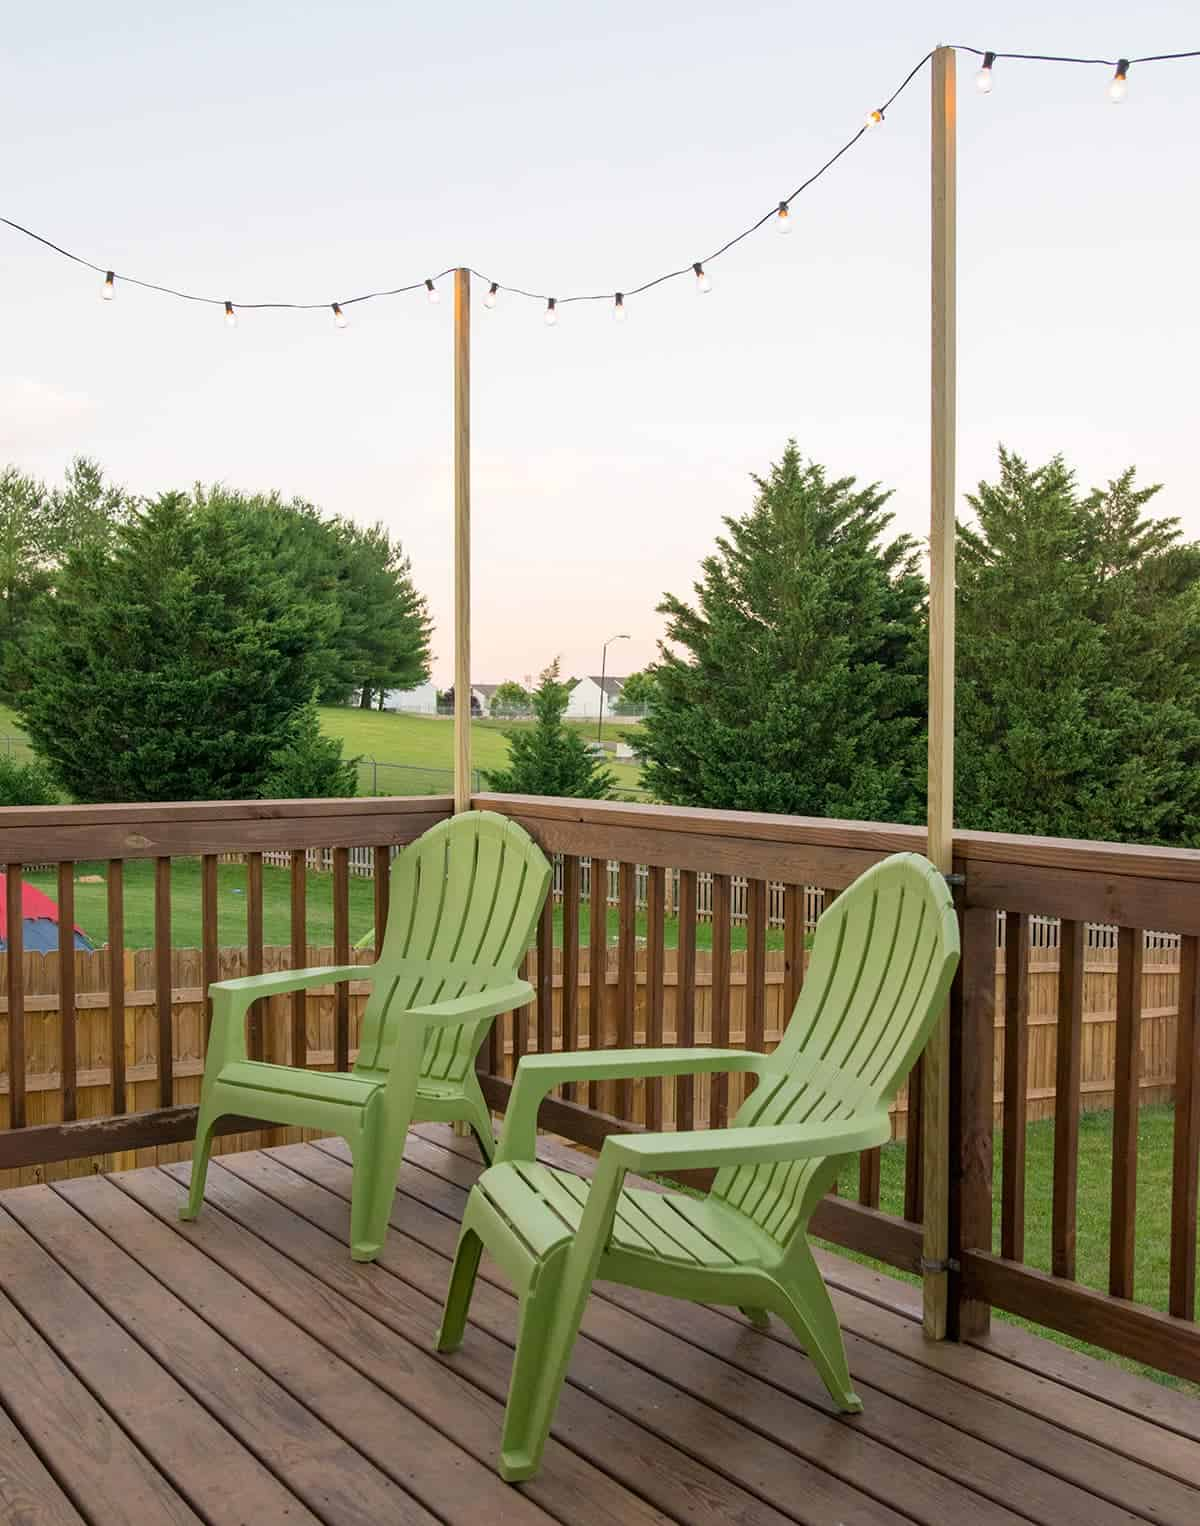 Outdoor Deck String Lights for Fun Summer Nights - Craving ... on Backyard String Lights Diy id=62459